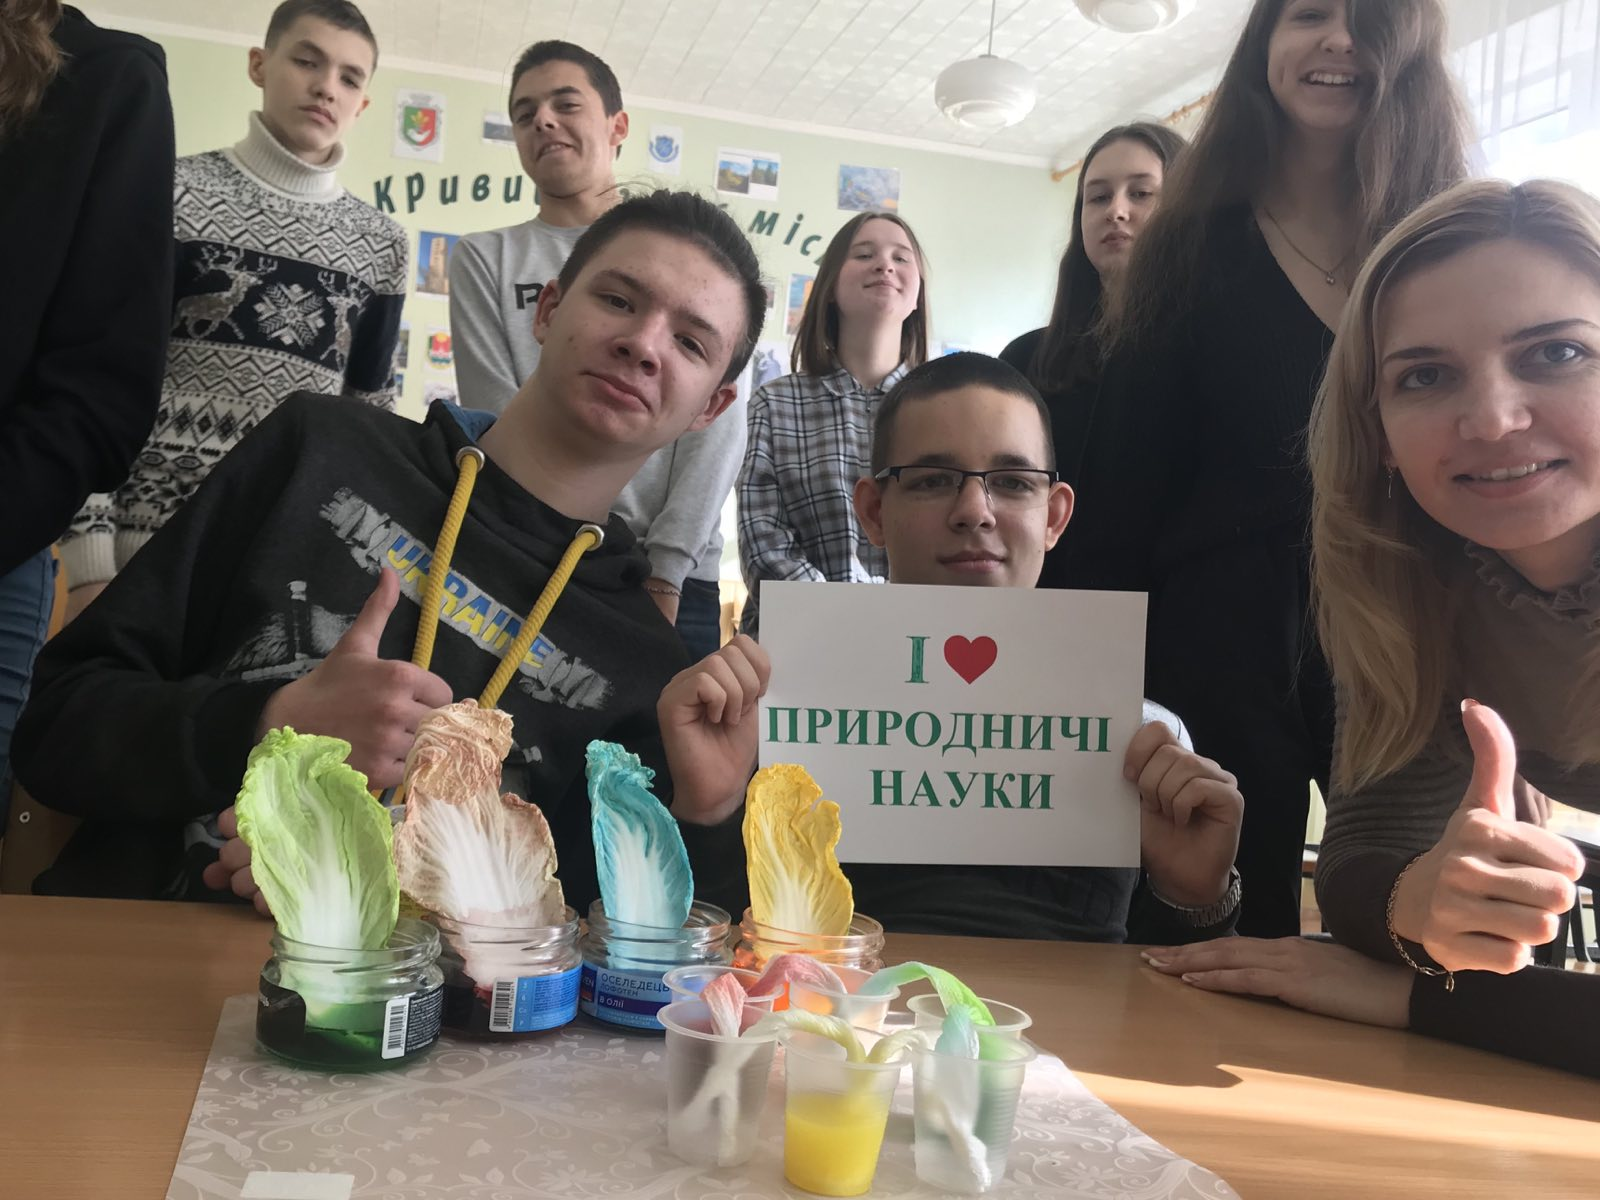 praktichni-doslidzhennya-v-kursi-prirodnichi-nauki-grarl